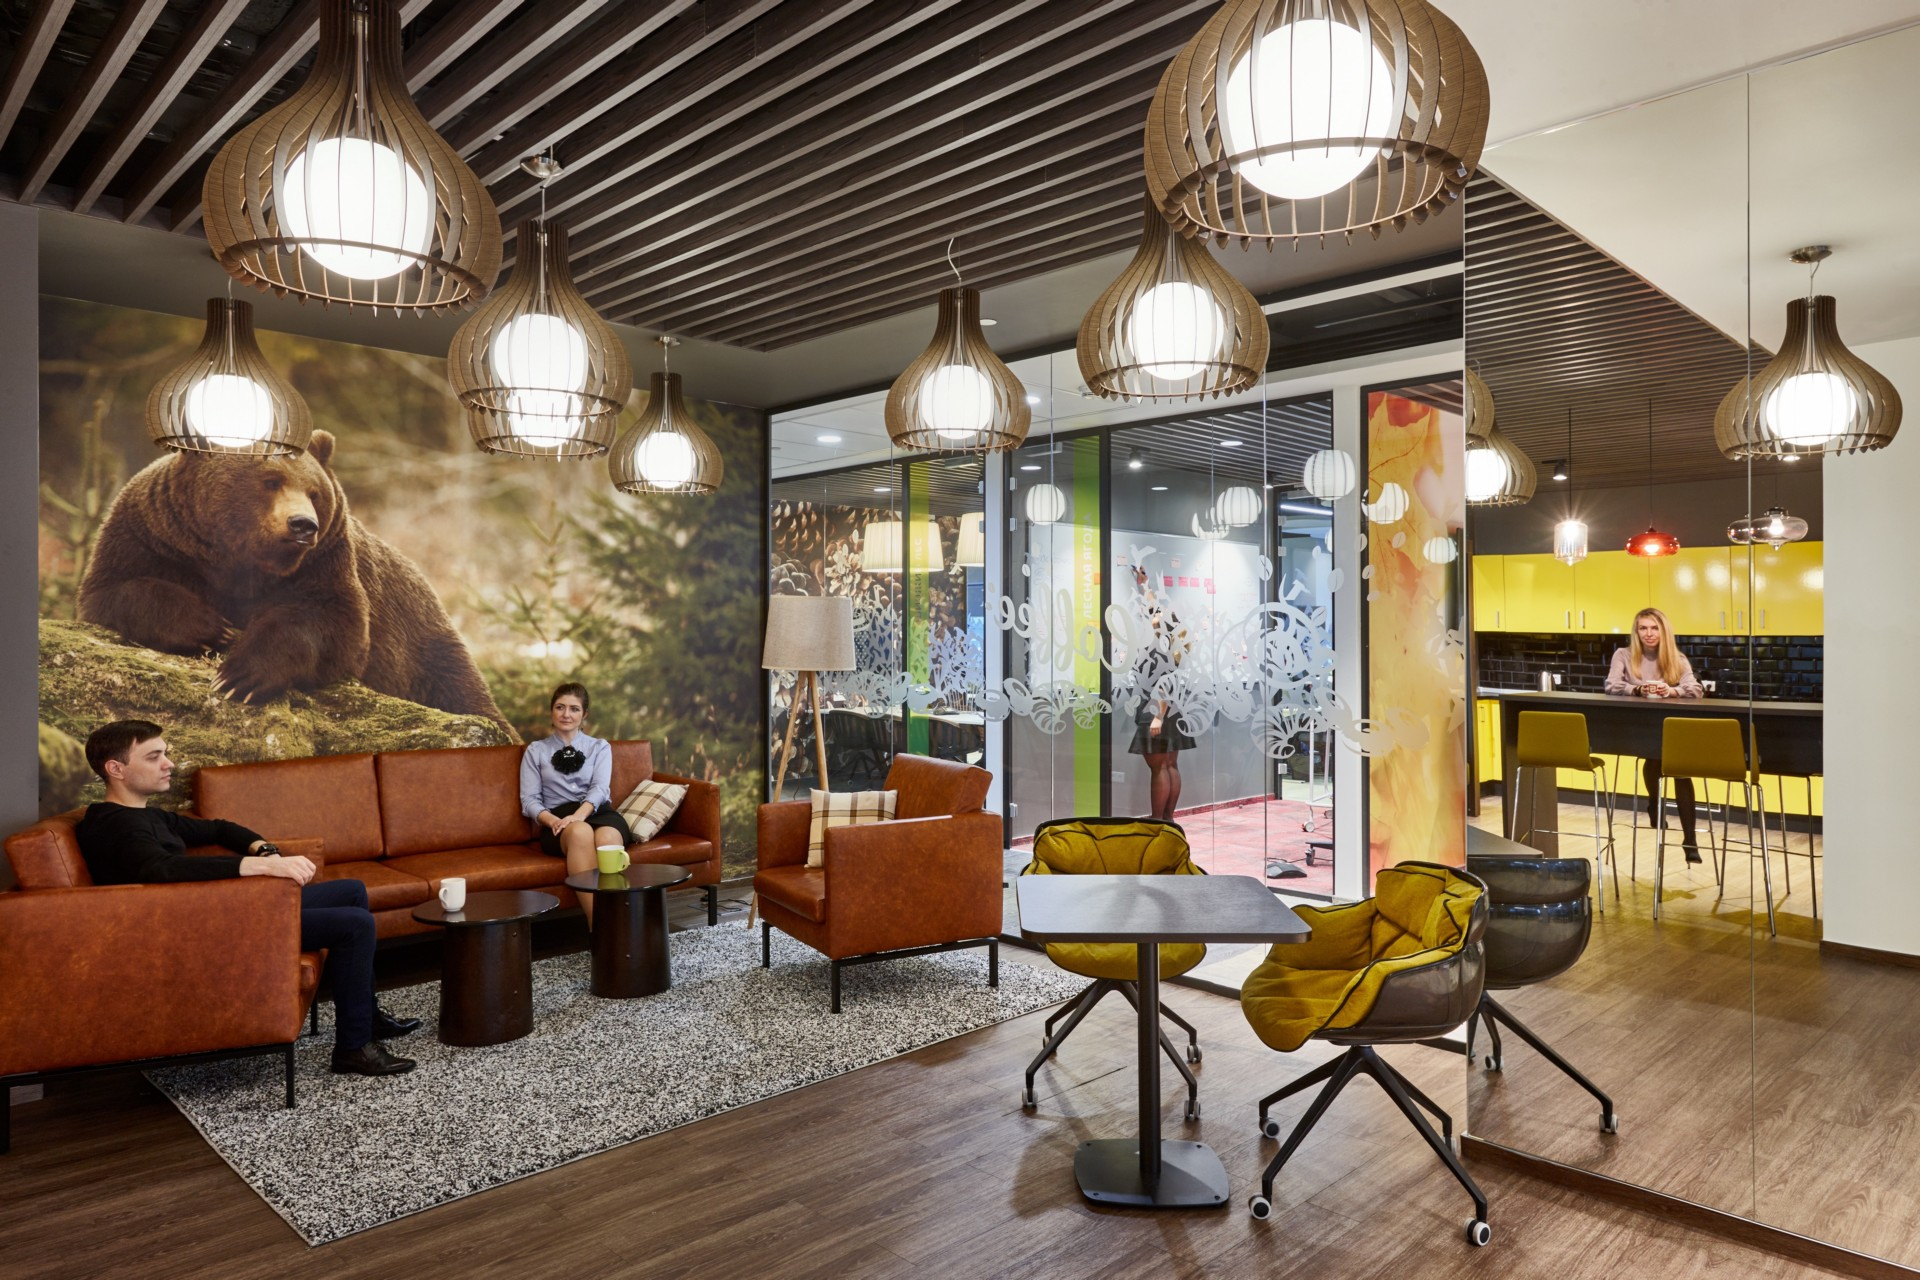 google russia office google russia office evolution design creates headquarters like googles for sberbank sberbank russia st petersburg offices office designs